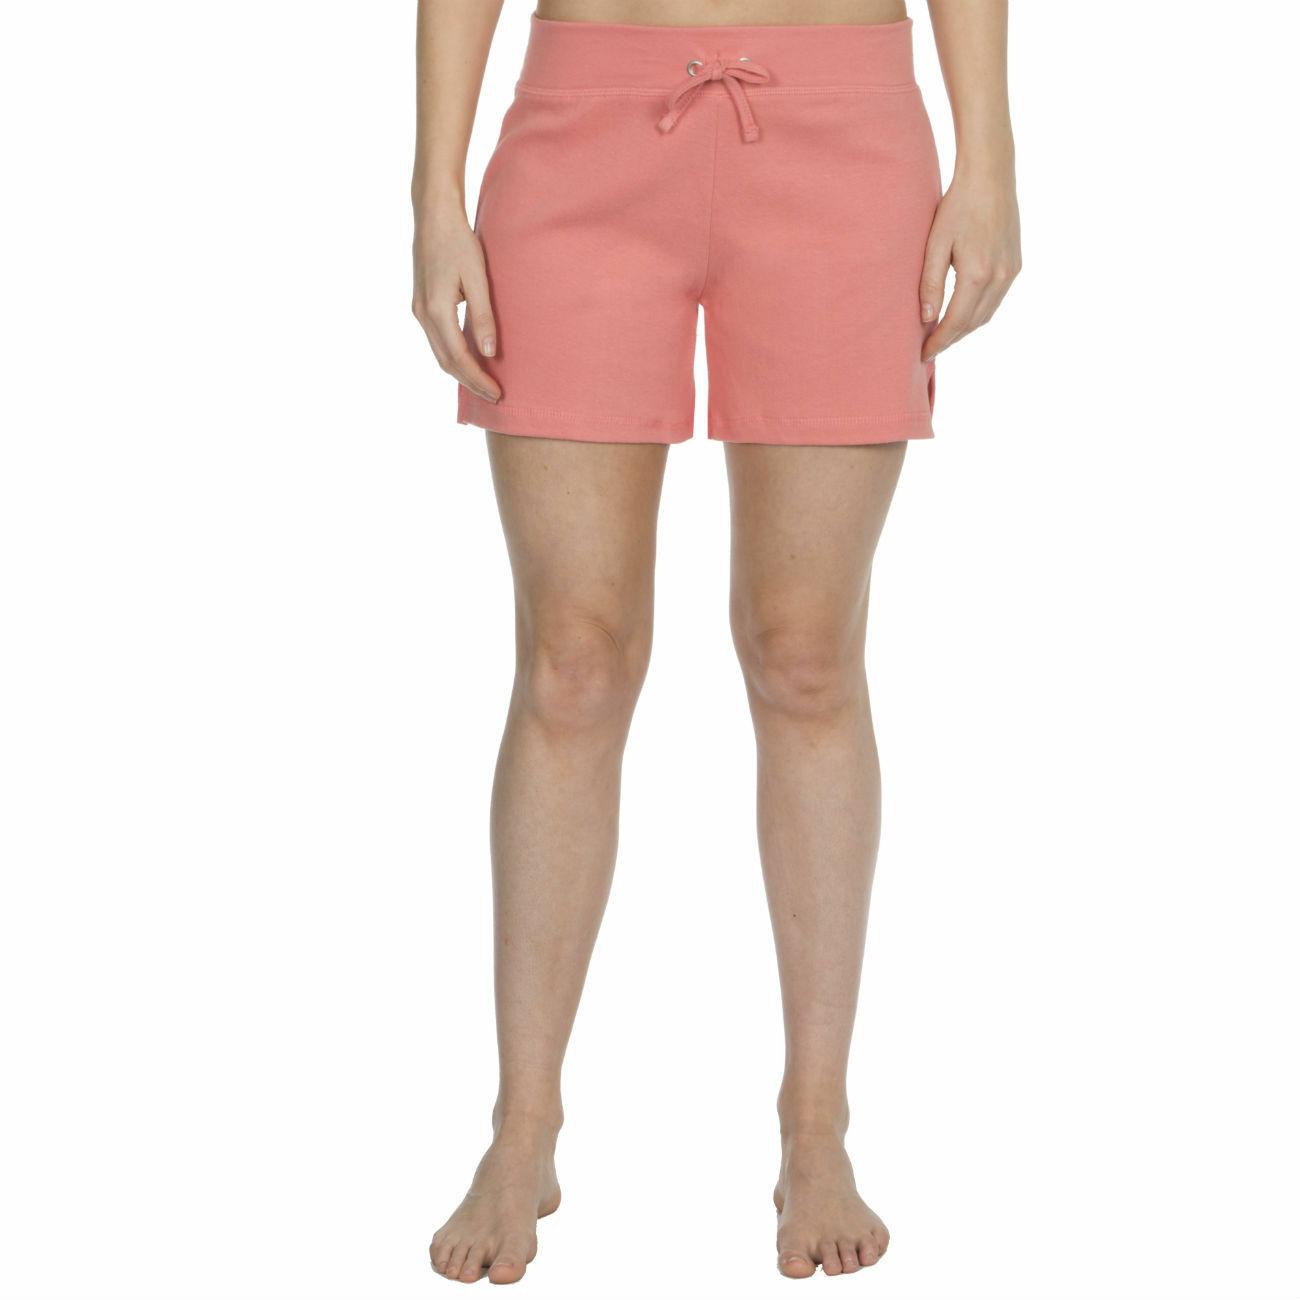 Womens-Cotton-Jersey-Shorts-Elastic-Waist-Summer-Beach-Casual-Yoga-Hot-Pants-New thumbnail 35